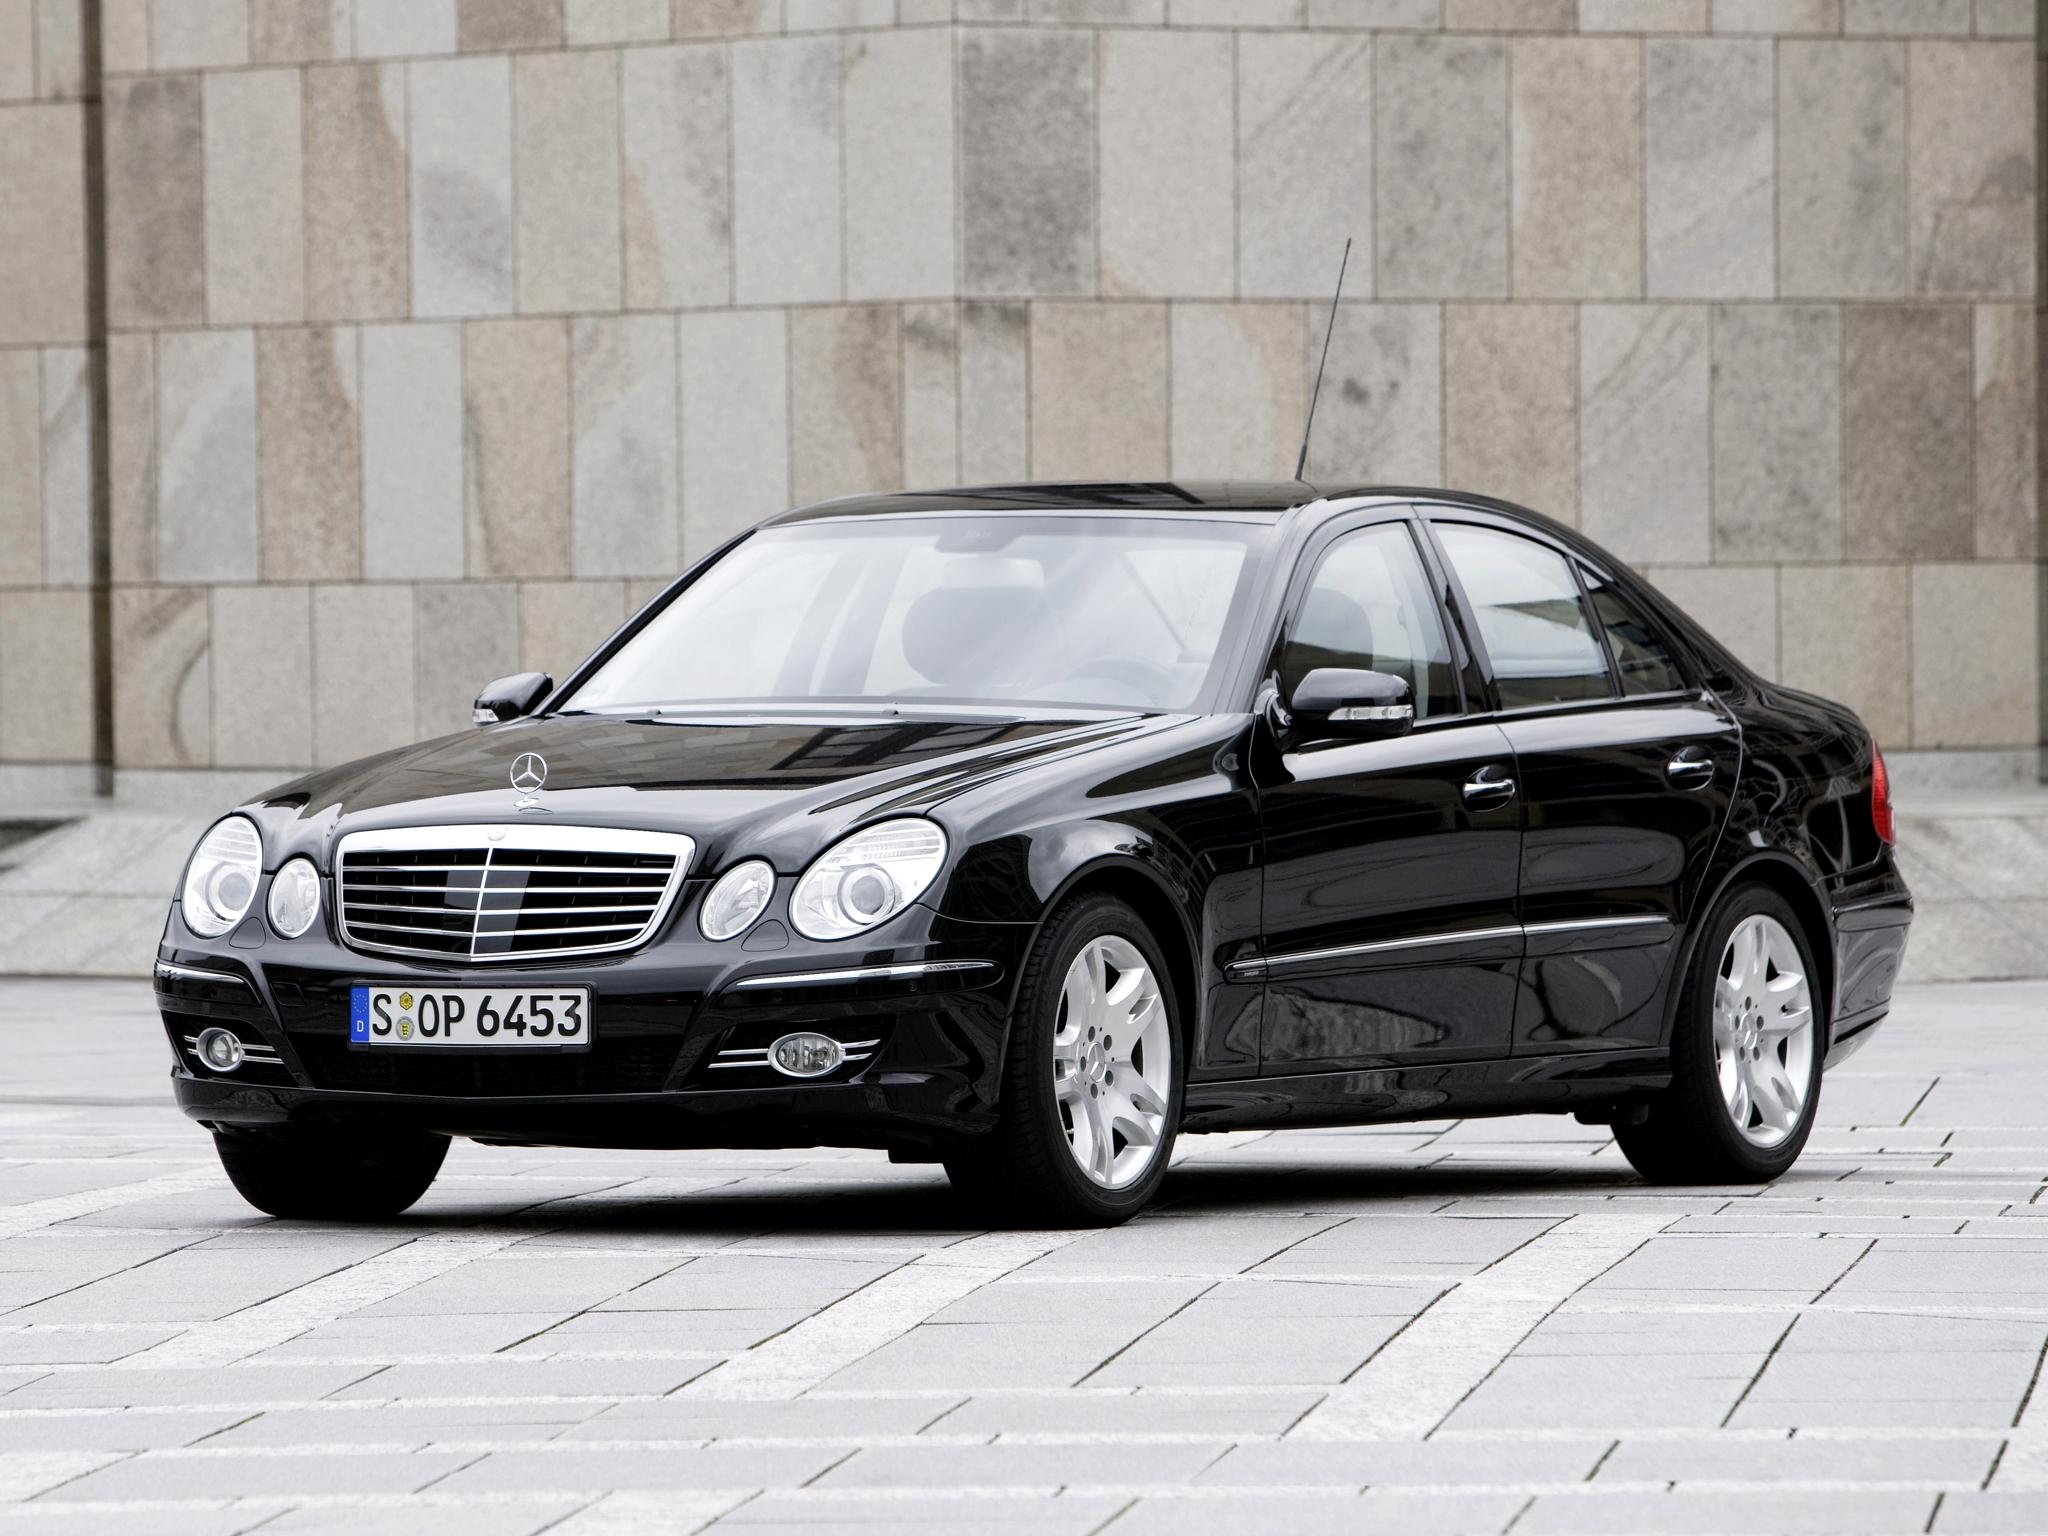 2006 Armored Mercedes Benz E Klasse Guard W211 Luxury G